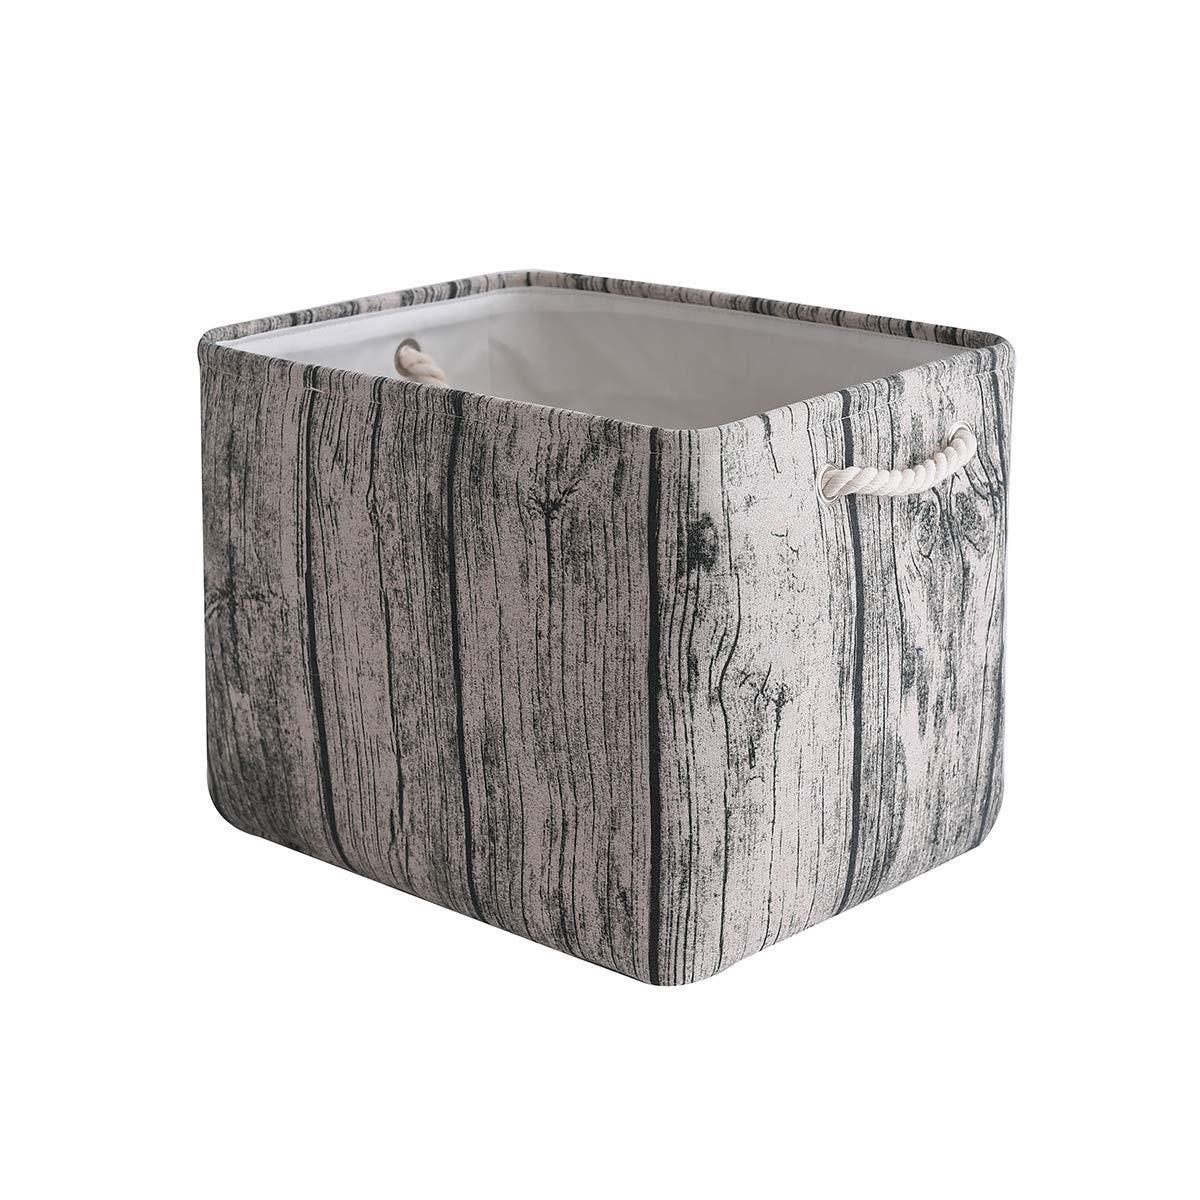 TcaFmac Storage Basket, Canvas Storage Bin, Basket for Storage, Decorative Basket, Dog Toy Basket with Handles, Empty Gift Basket for Baby Storage, Basket for Shelves 16(L) x 12(W) x 12(H) inch